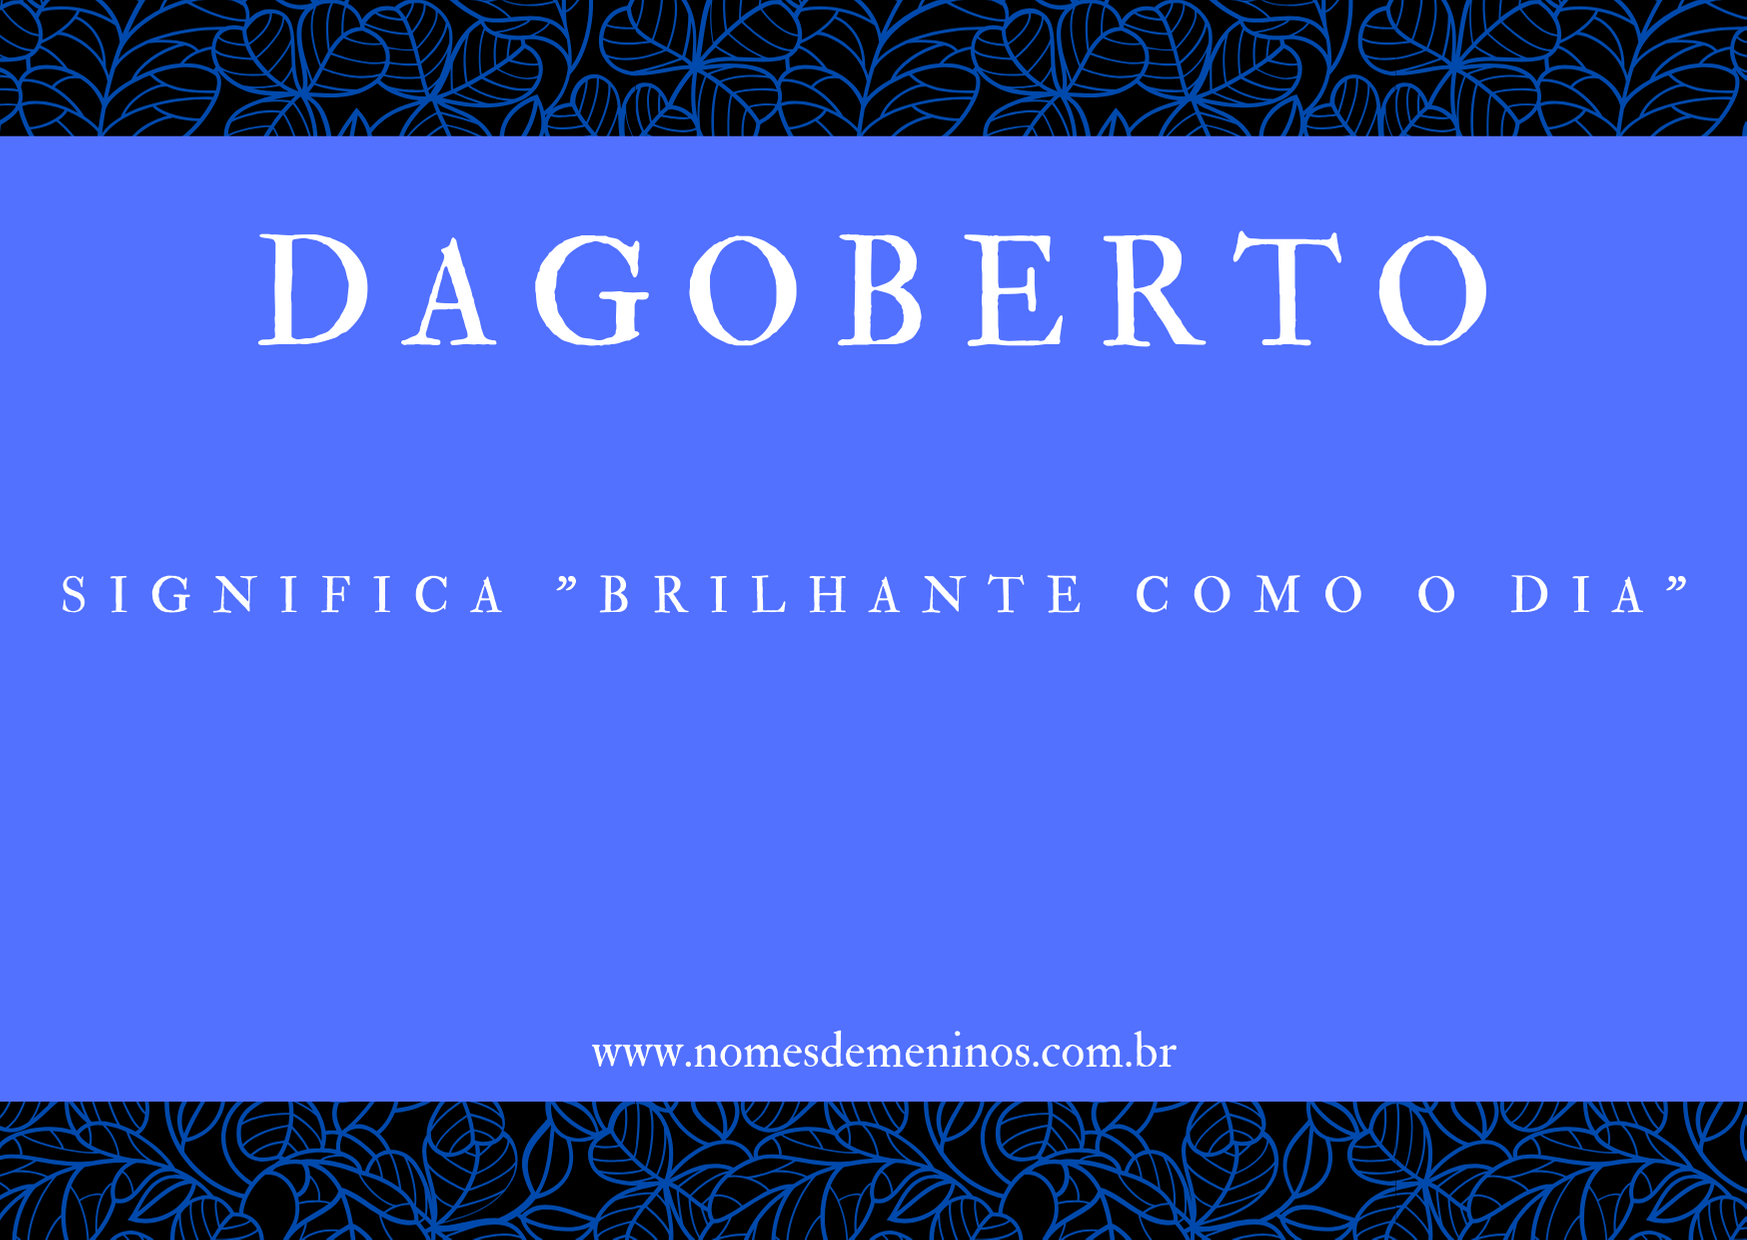 nome Dagoberto